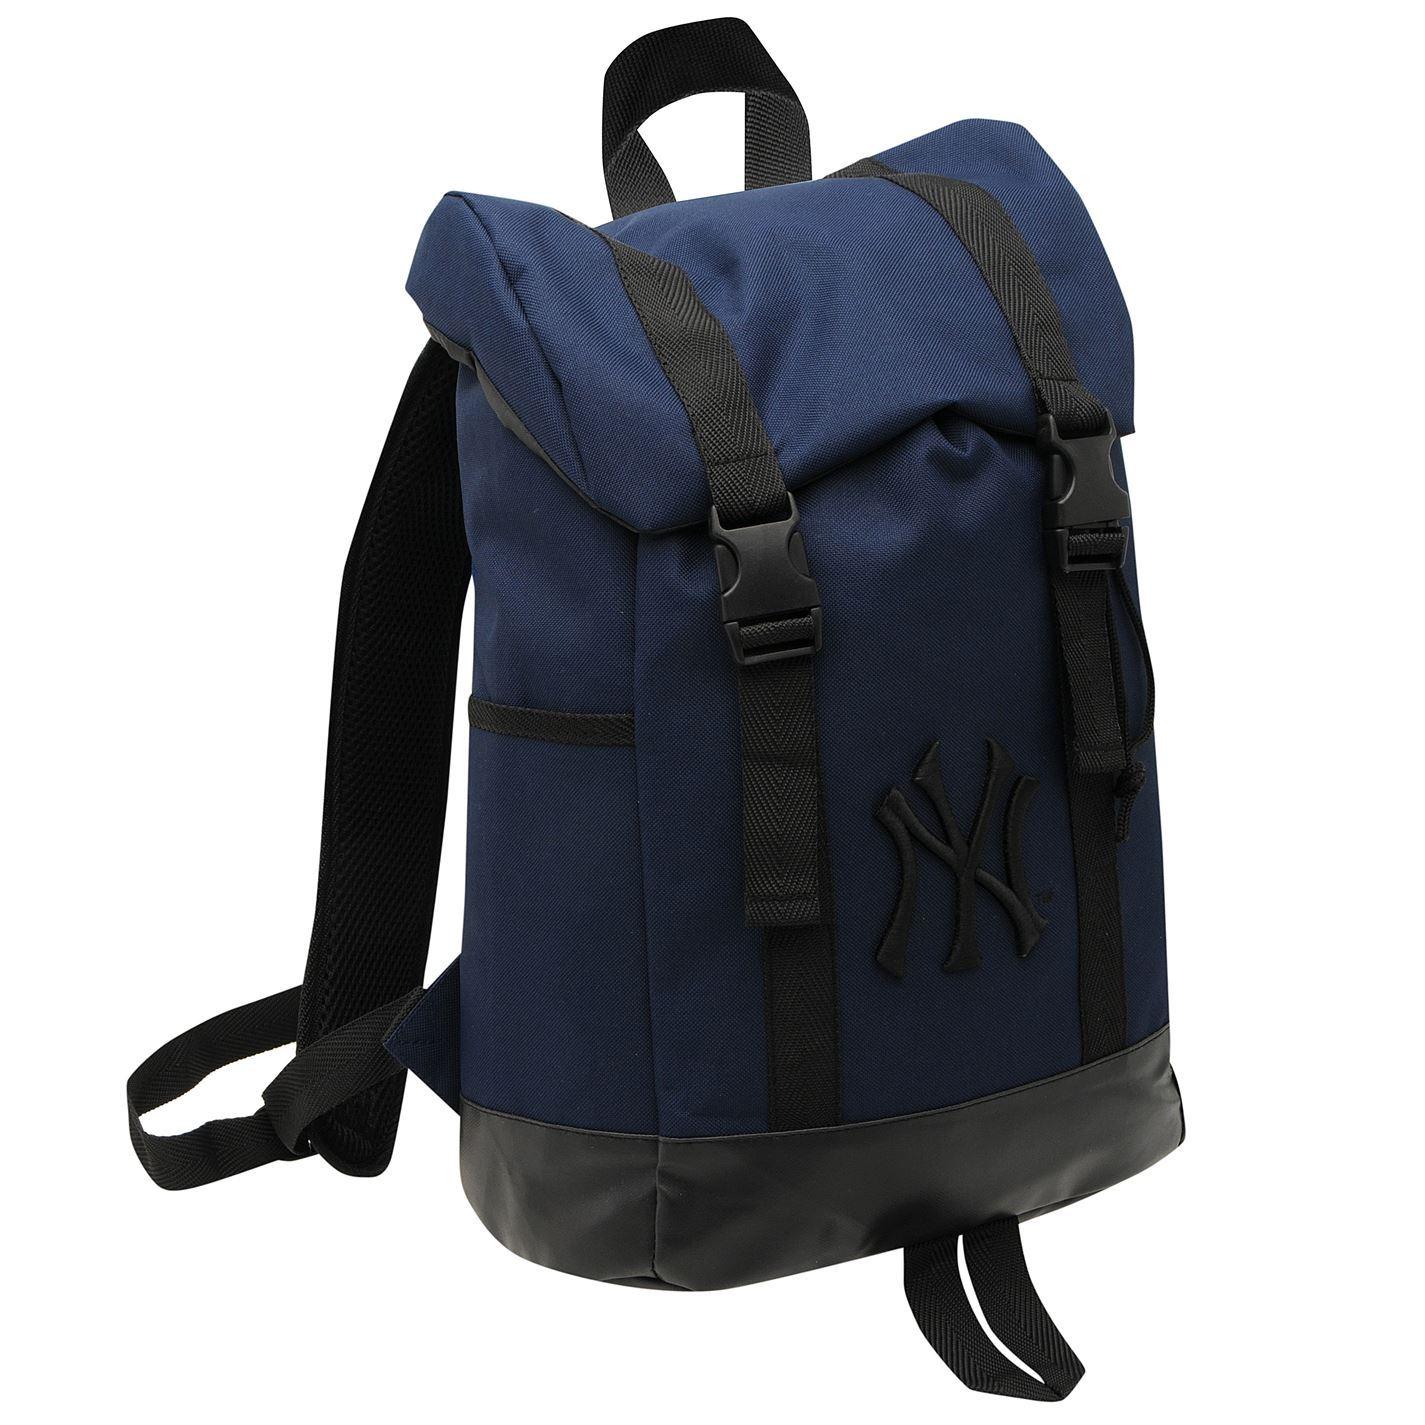 new york yankees duffle backpack mens navy rucksack bag. Black Bedroom Furniture Sets. Home Design Ideas